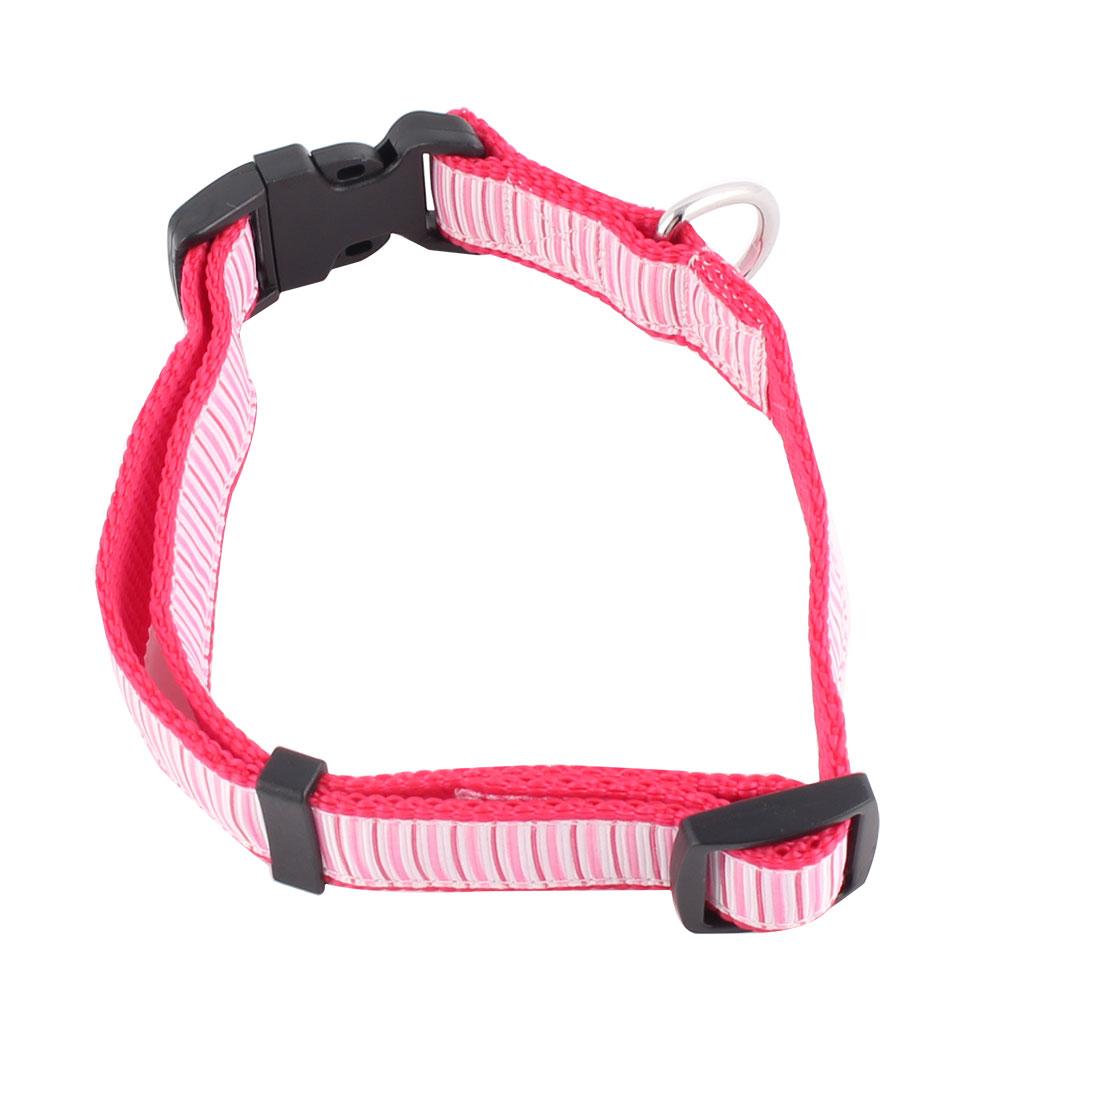 Pet Dog Nylon Stripe Pattern Adjustable Buckle Strap Belt Neck Collar Magenta